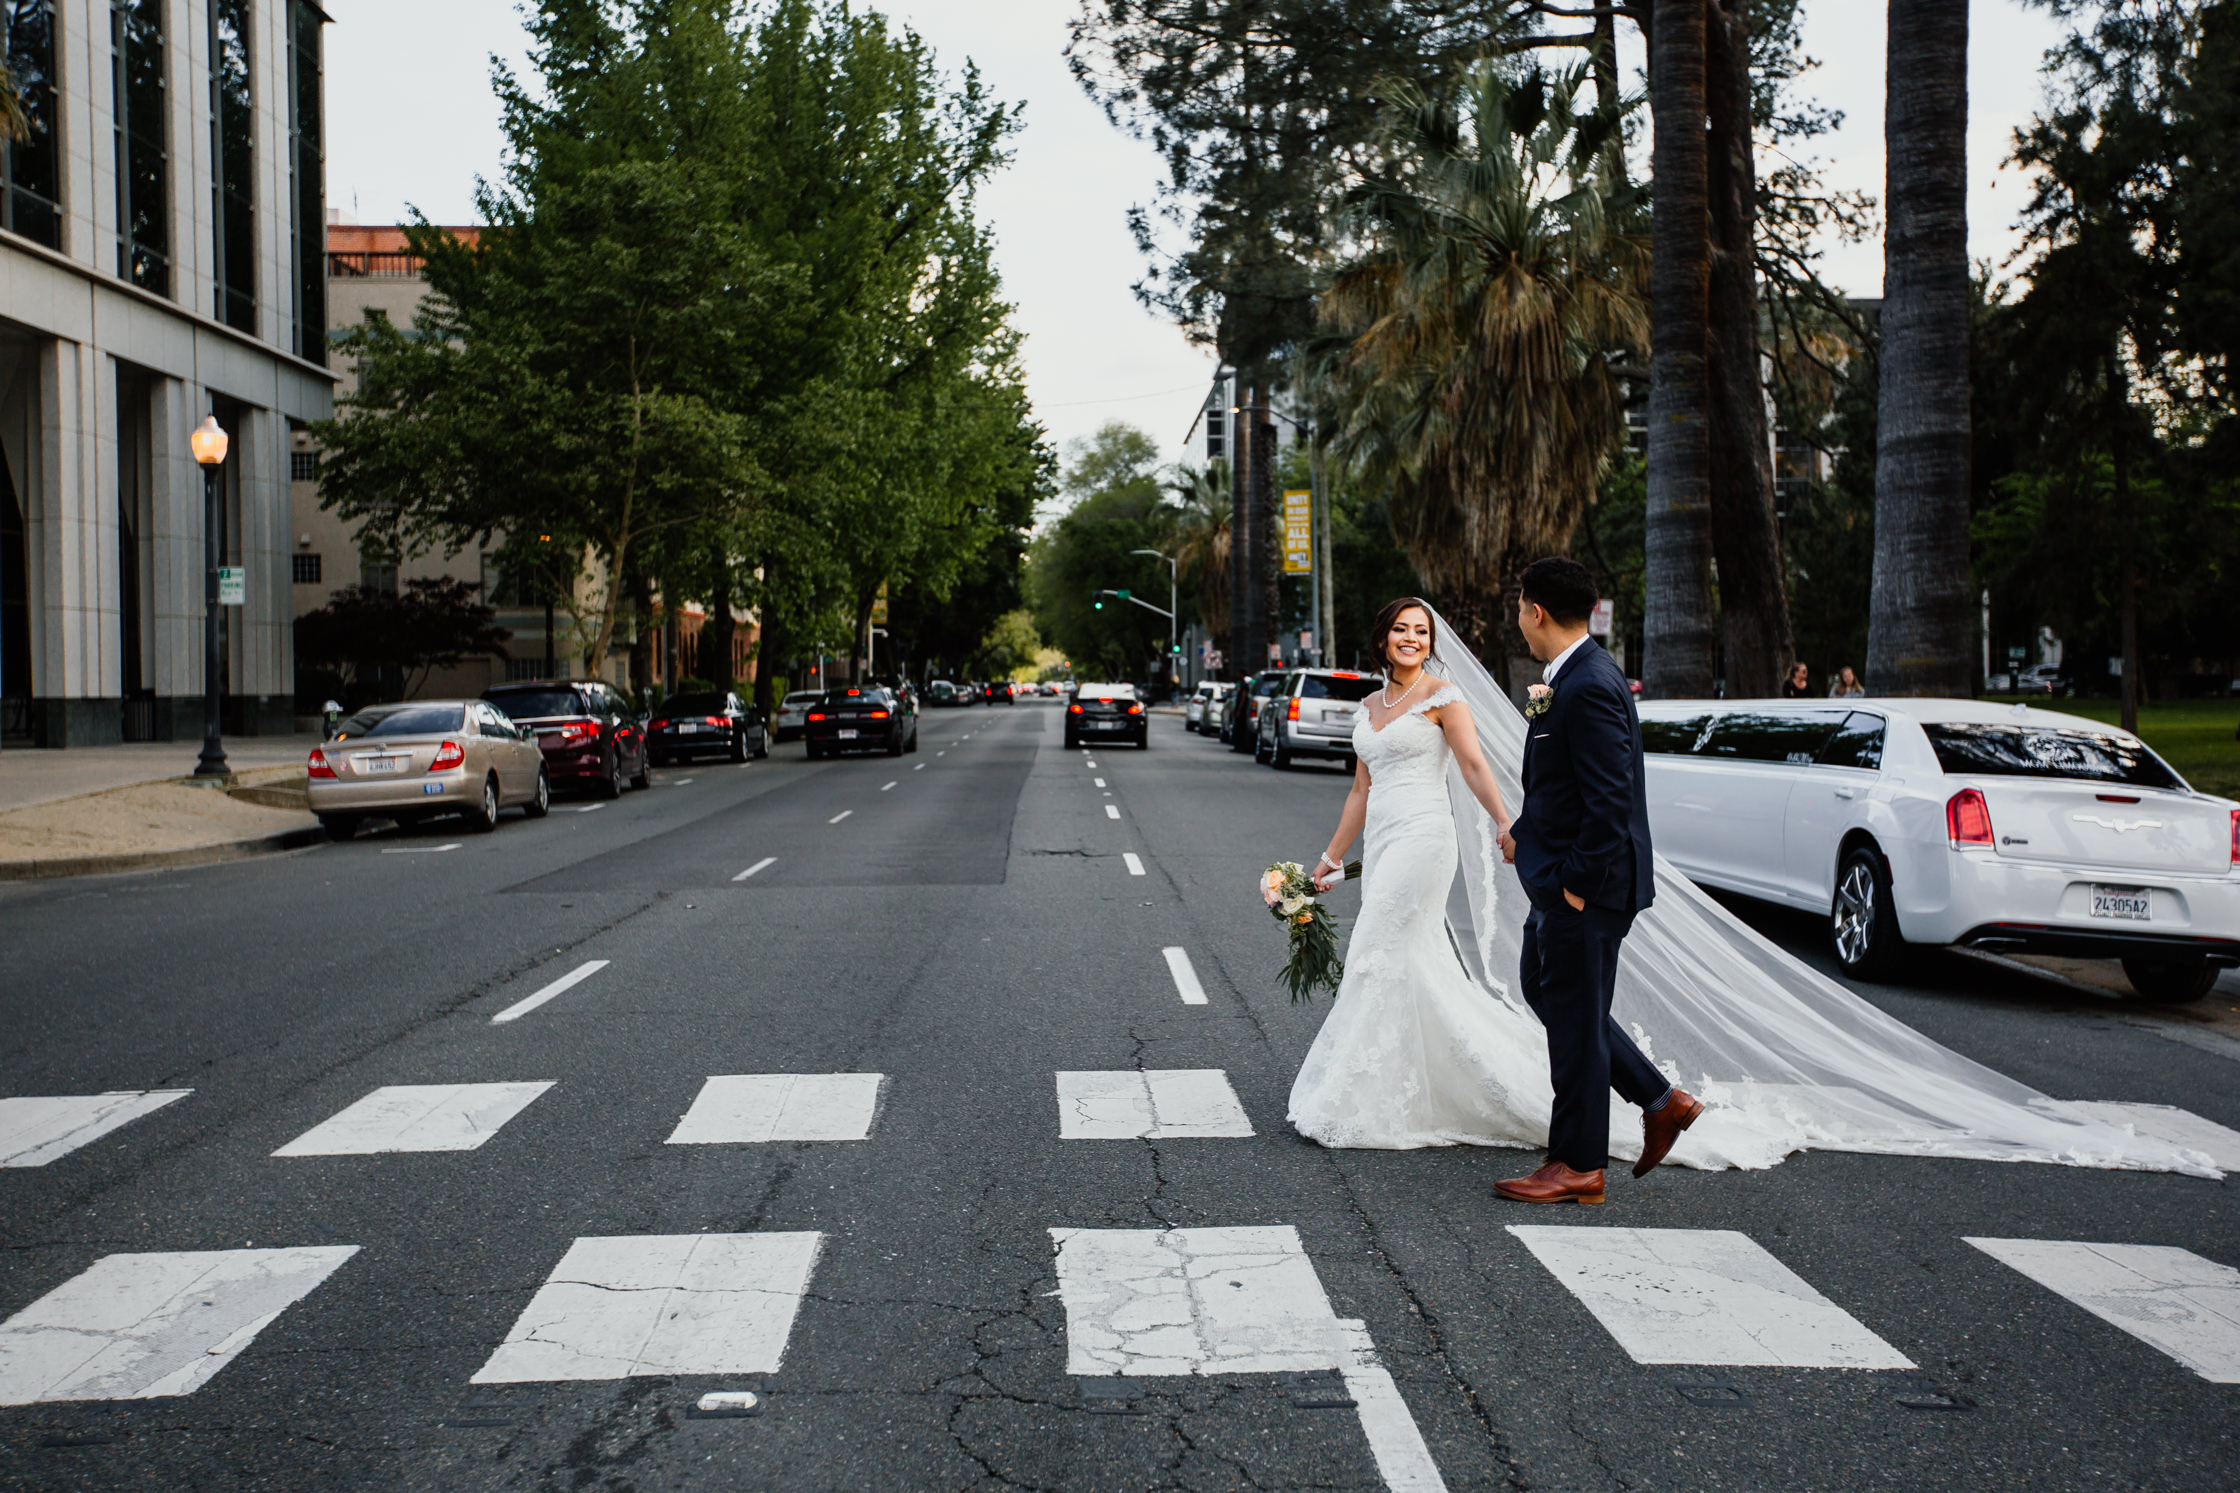 luis_joanna_wedding-60.jpg